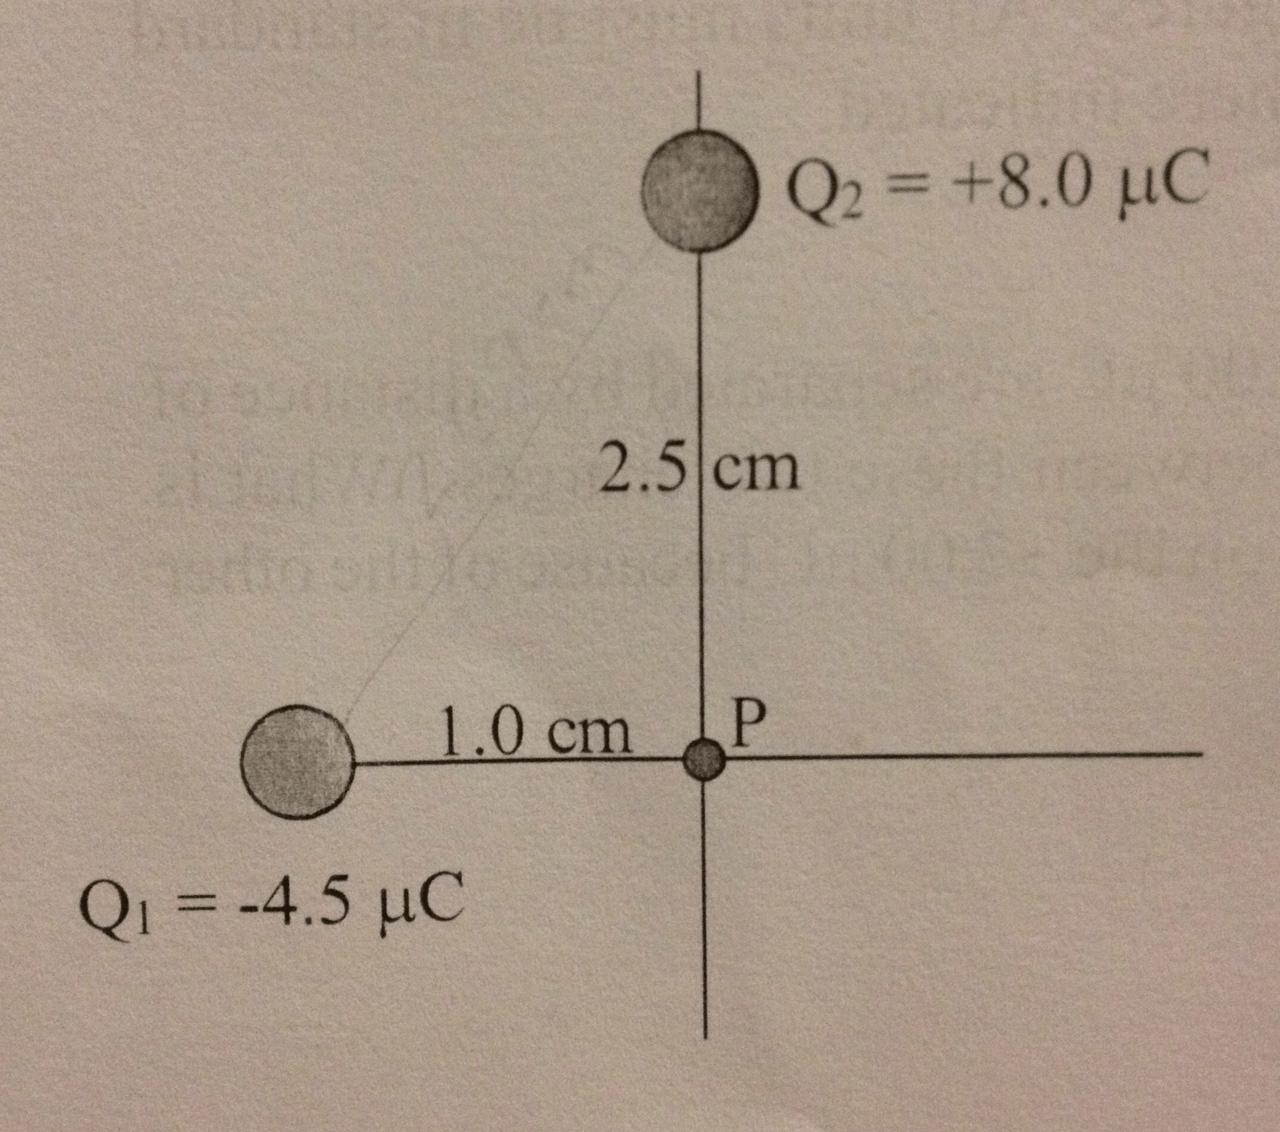 hight resolution of q2 8 0 uc 2 5 cm 1 0 cm lp q1 4 5 uc